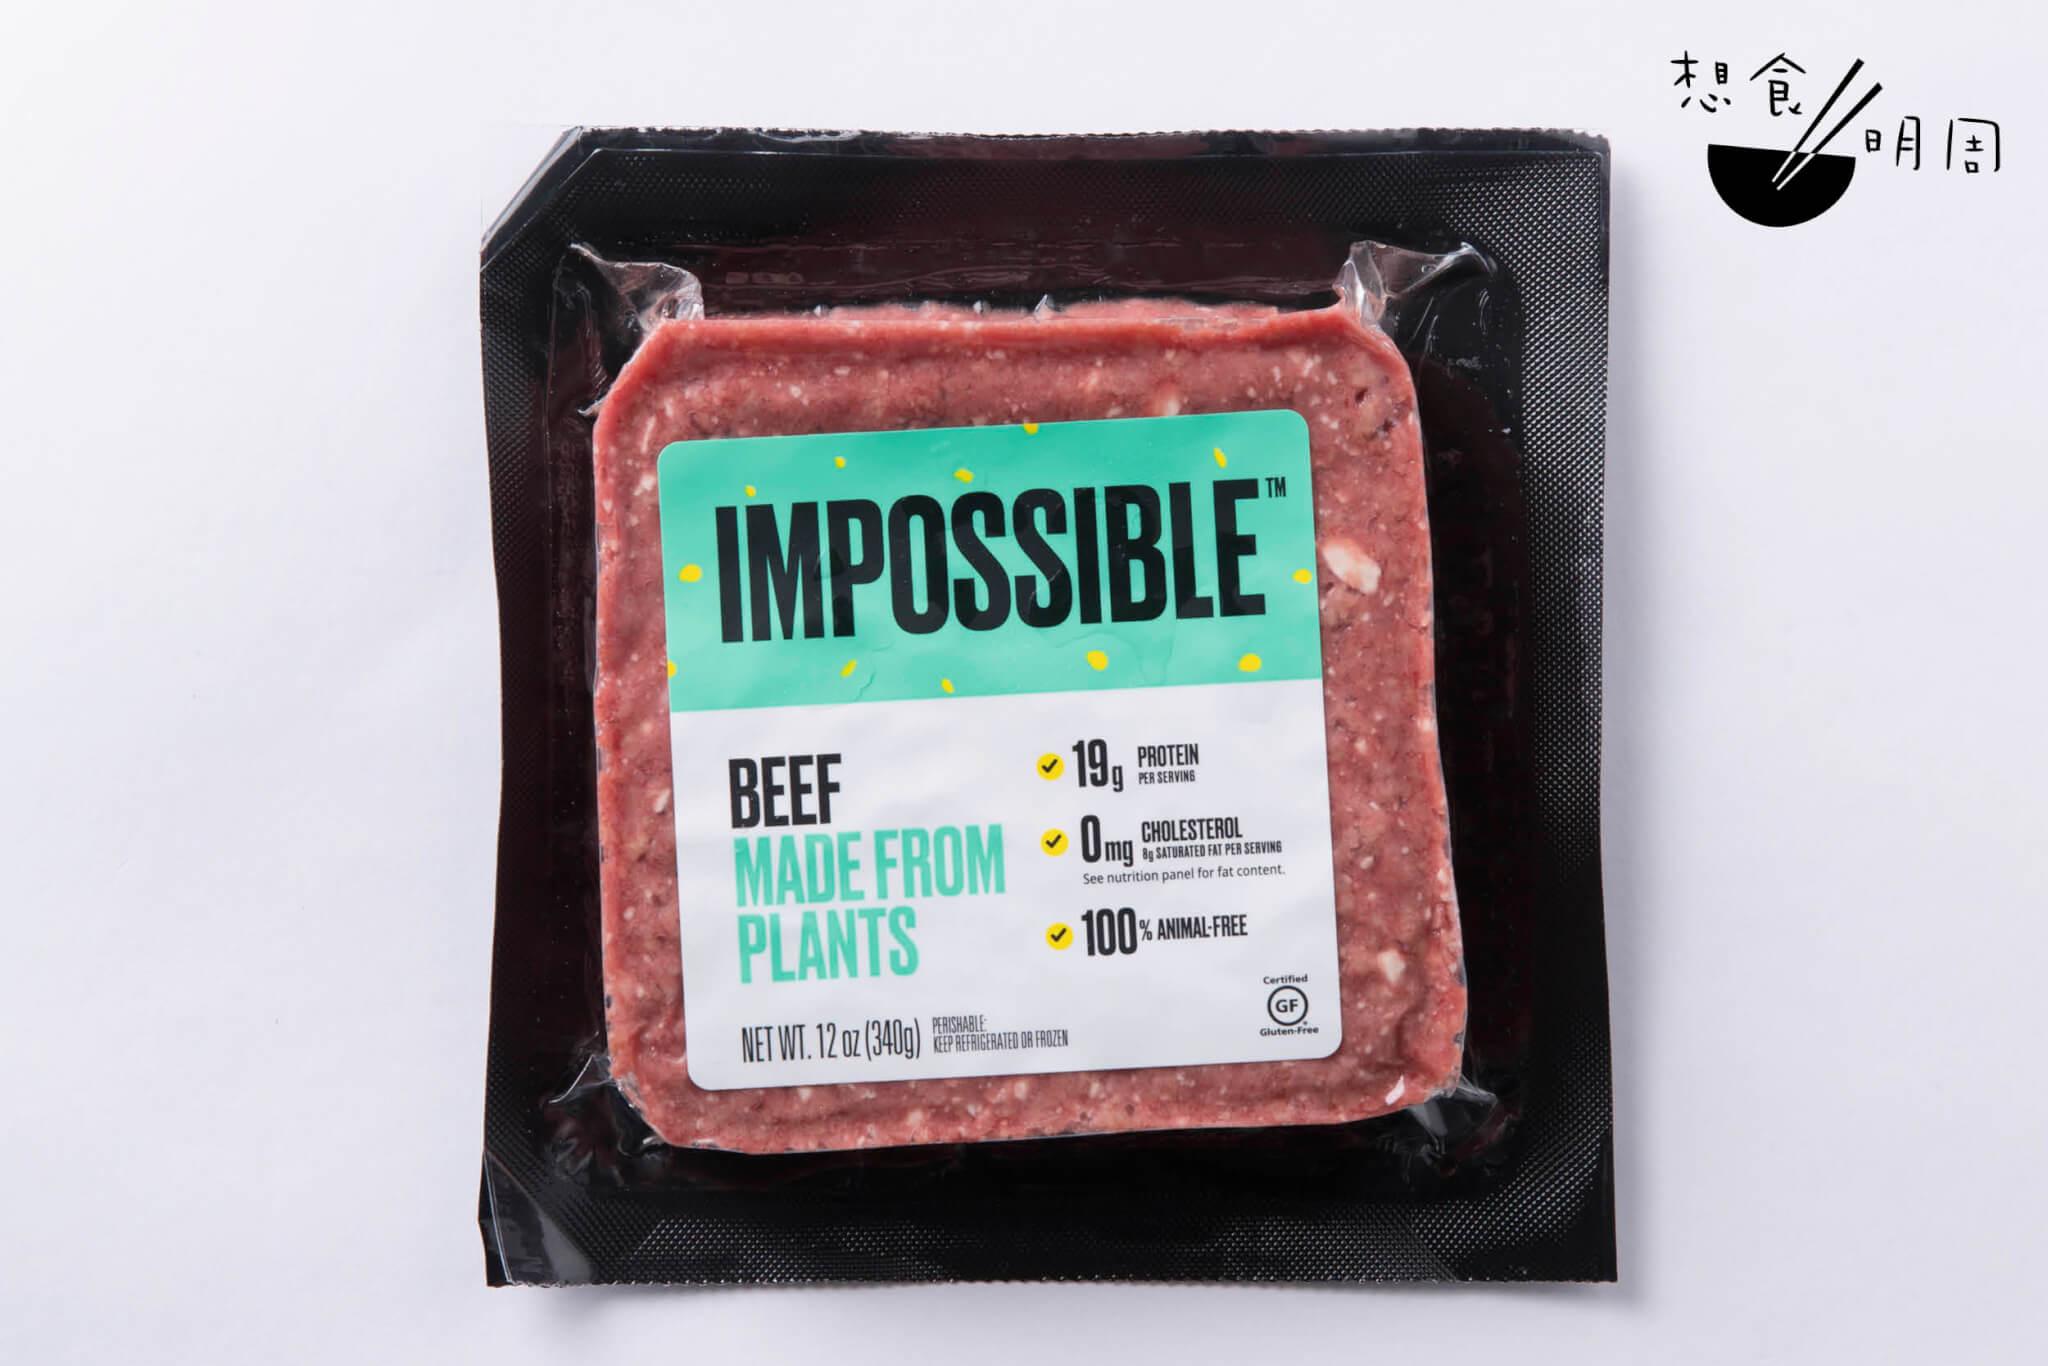 Impossible Meat 植物肉 // 急凍後即可使用,如同肉碎一樣,可隨意調味、搓壓。($89/12OZ)